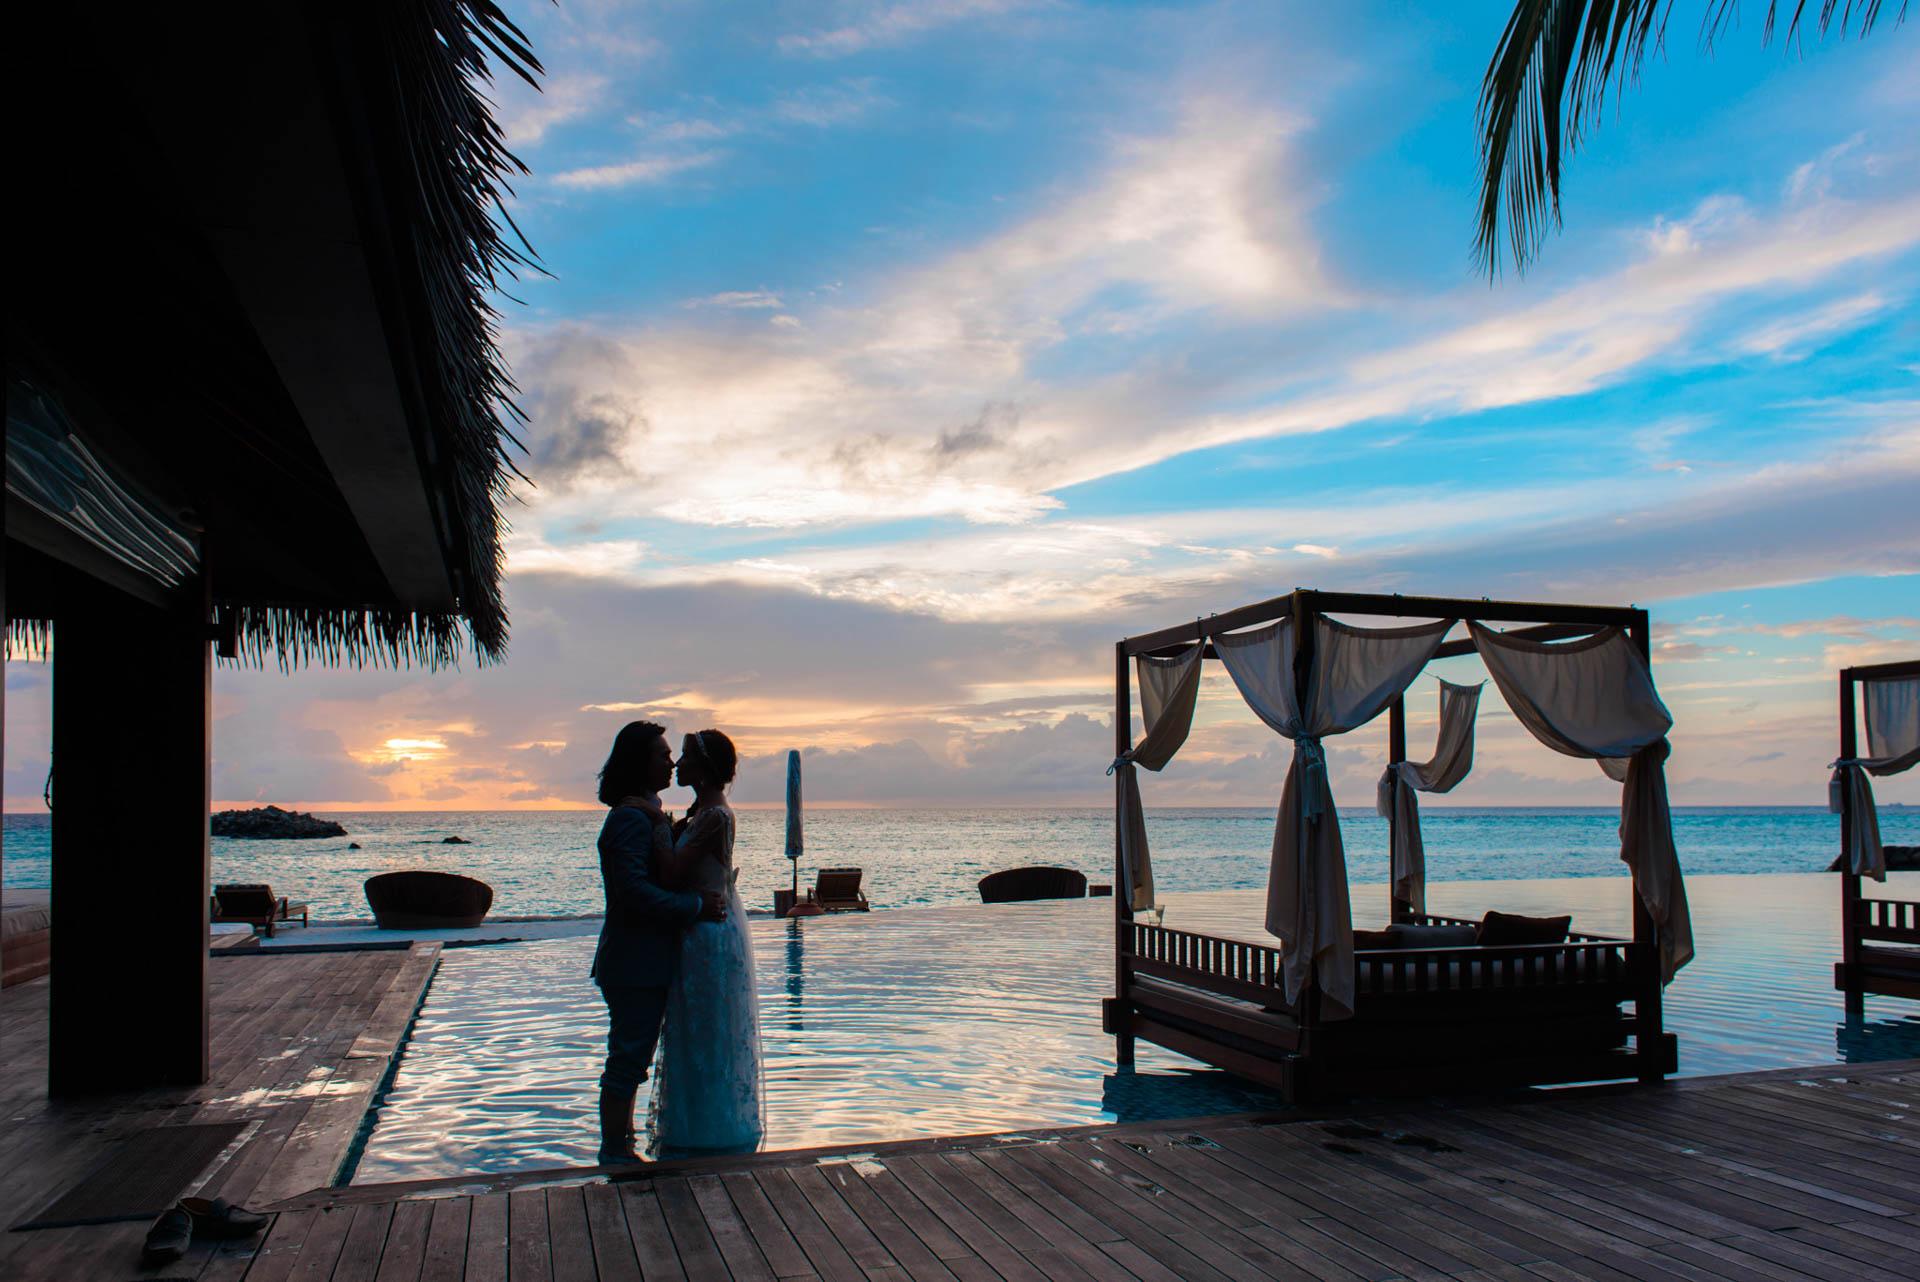 Chih Chao Yu Shan Destination Wedding at Residence Maldives 5